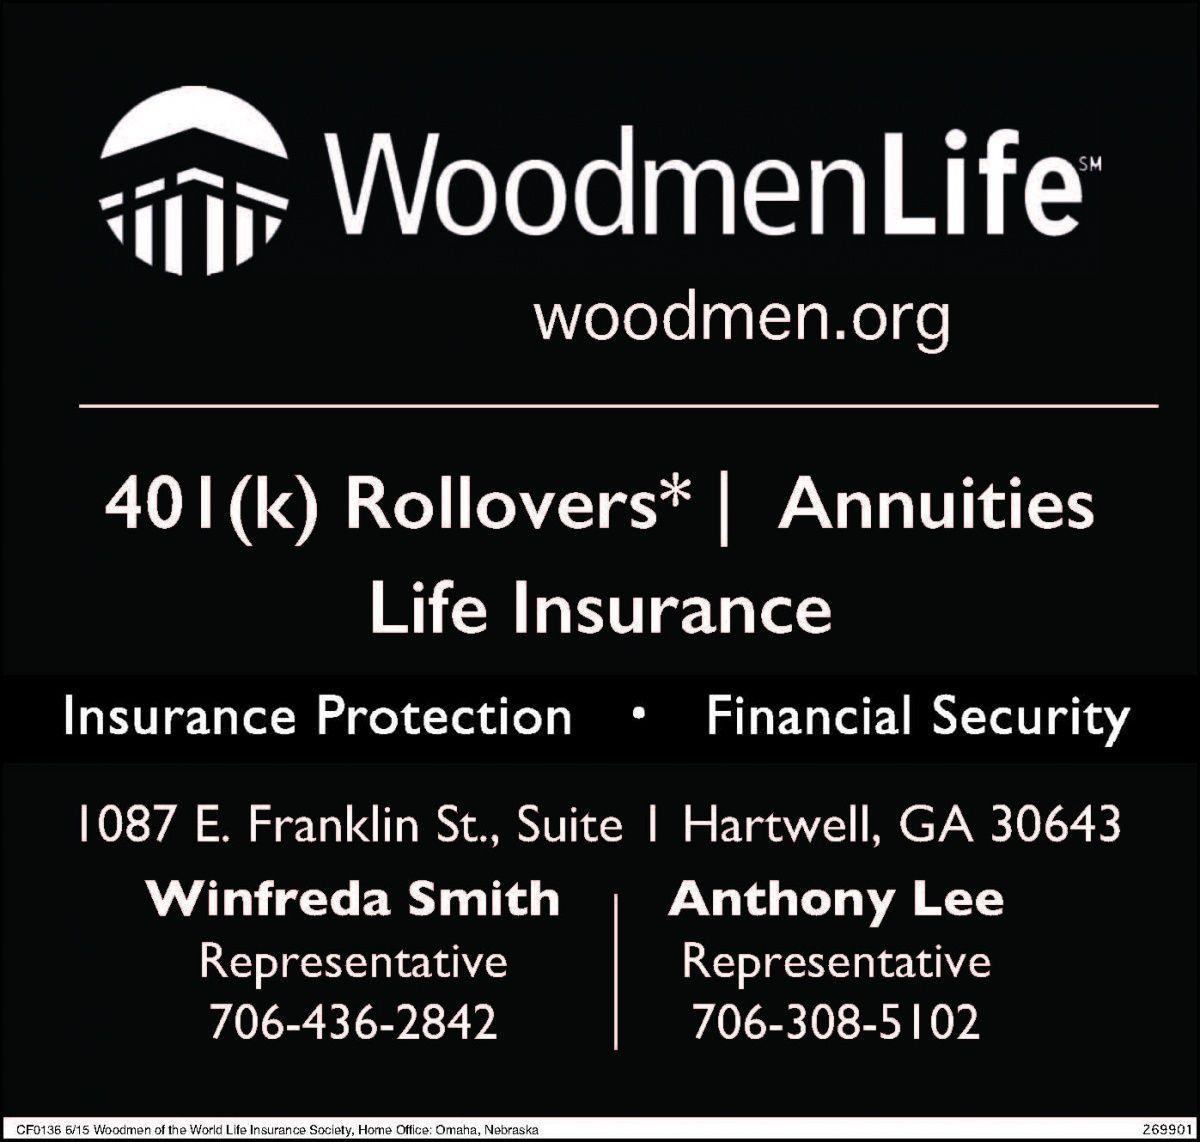 401 K Rollovers Annuities Life Insurance Woodmen Org Winfreda